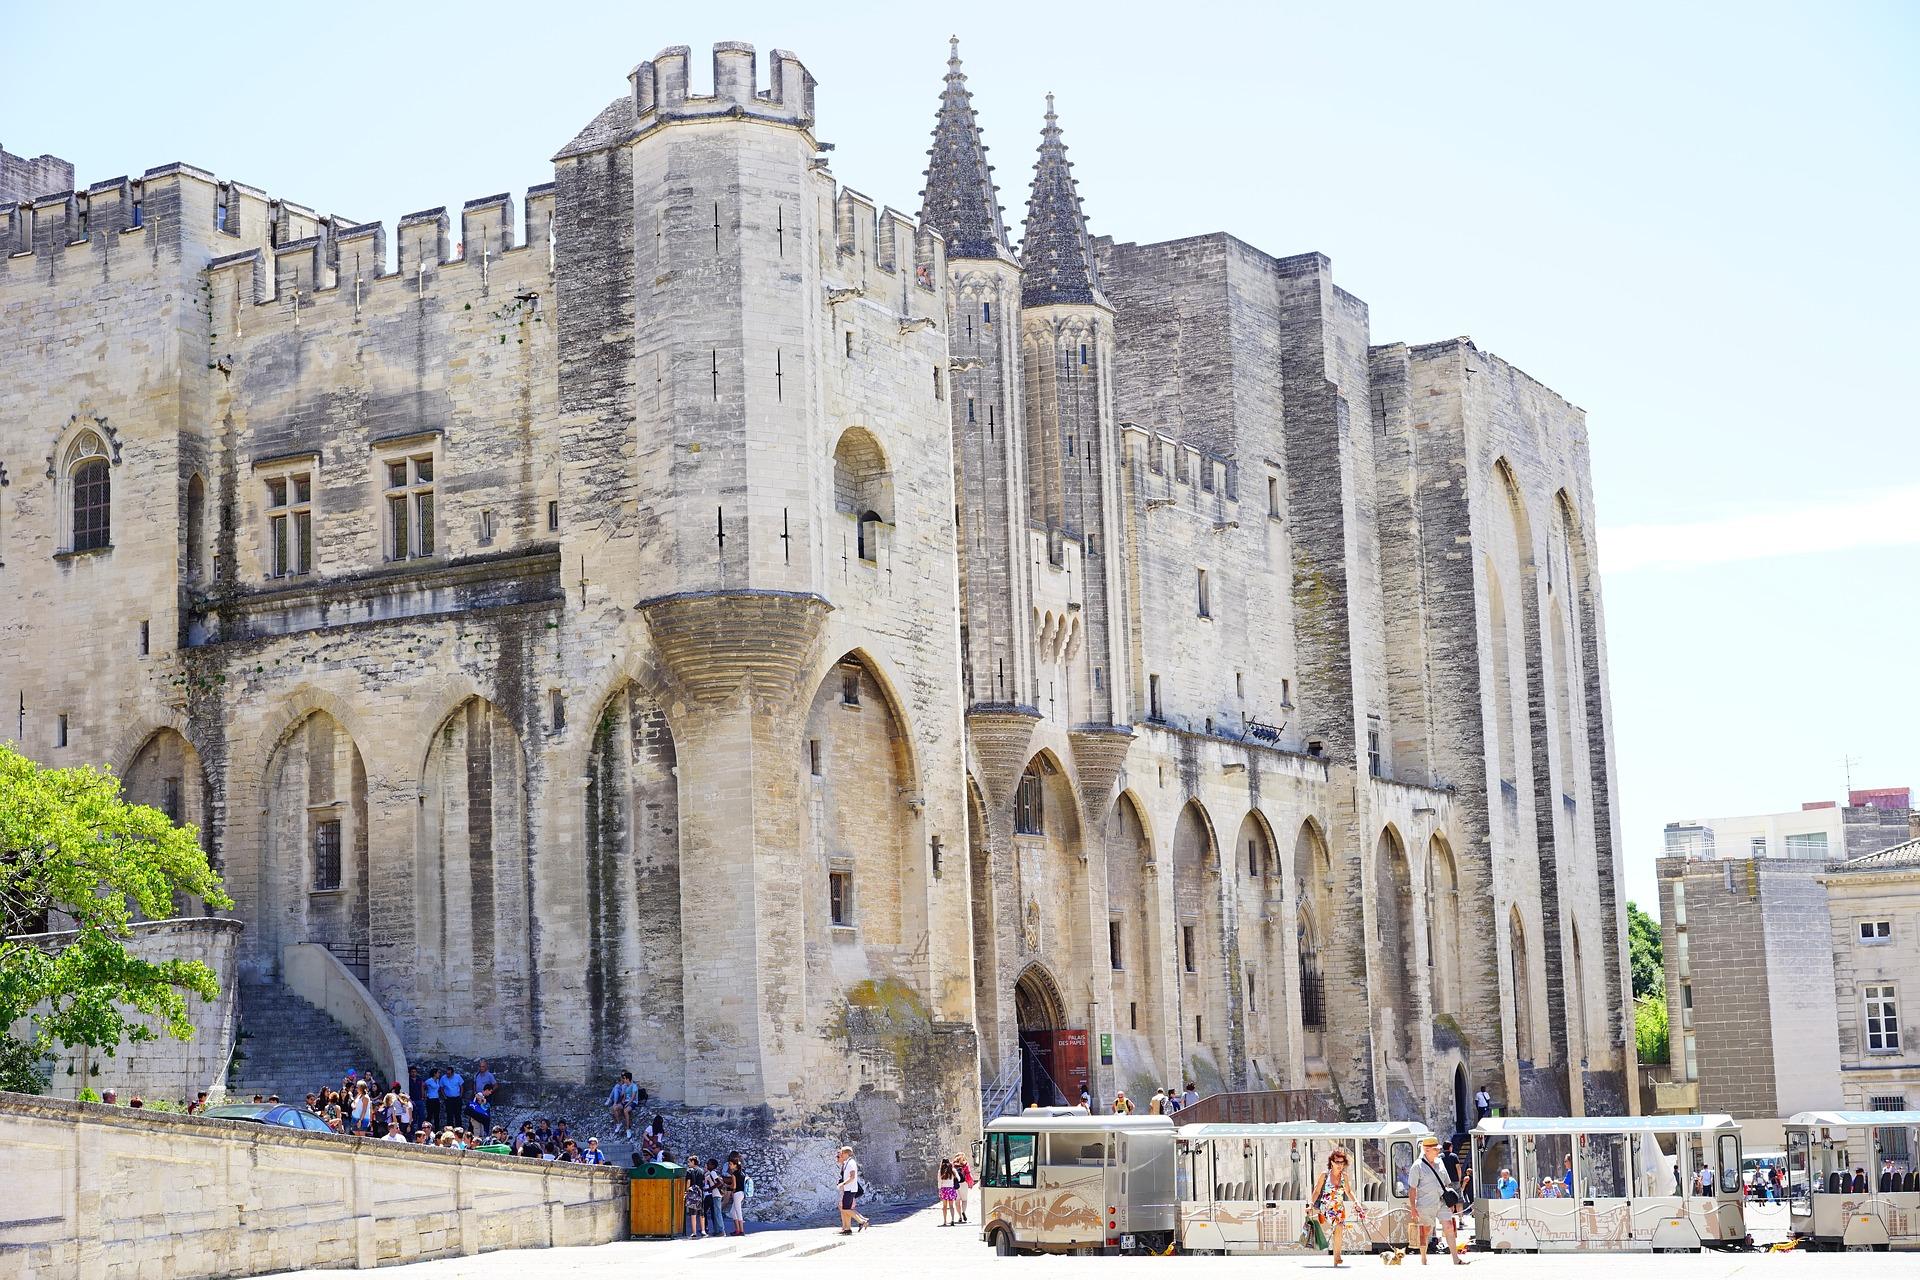 Rallye connecté pour découvrir Avignon